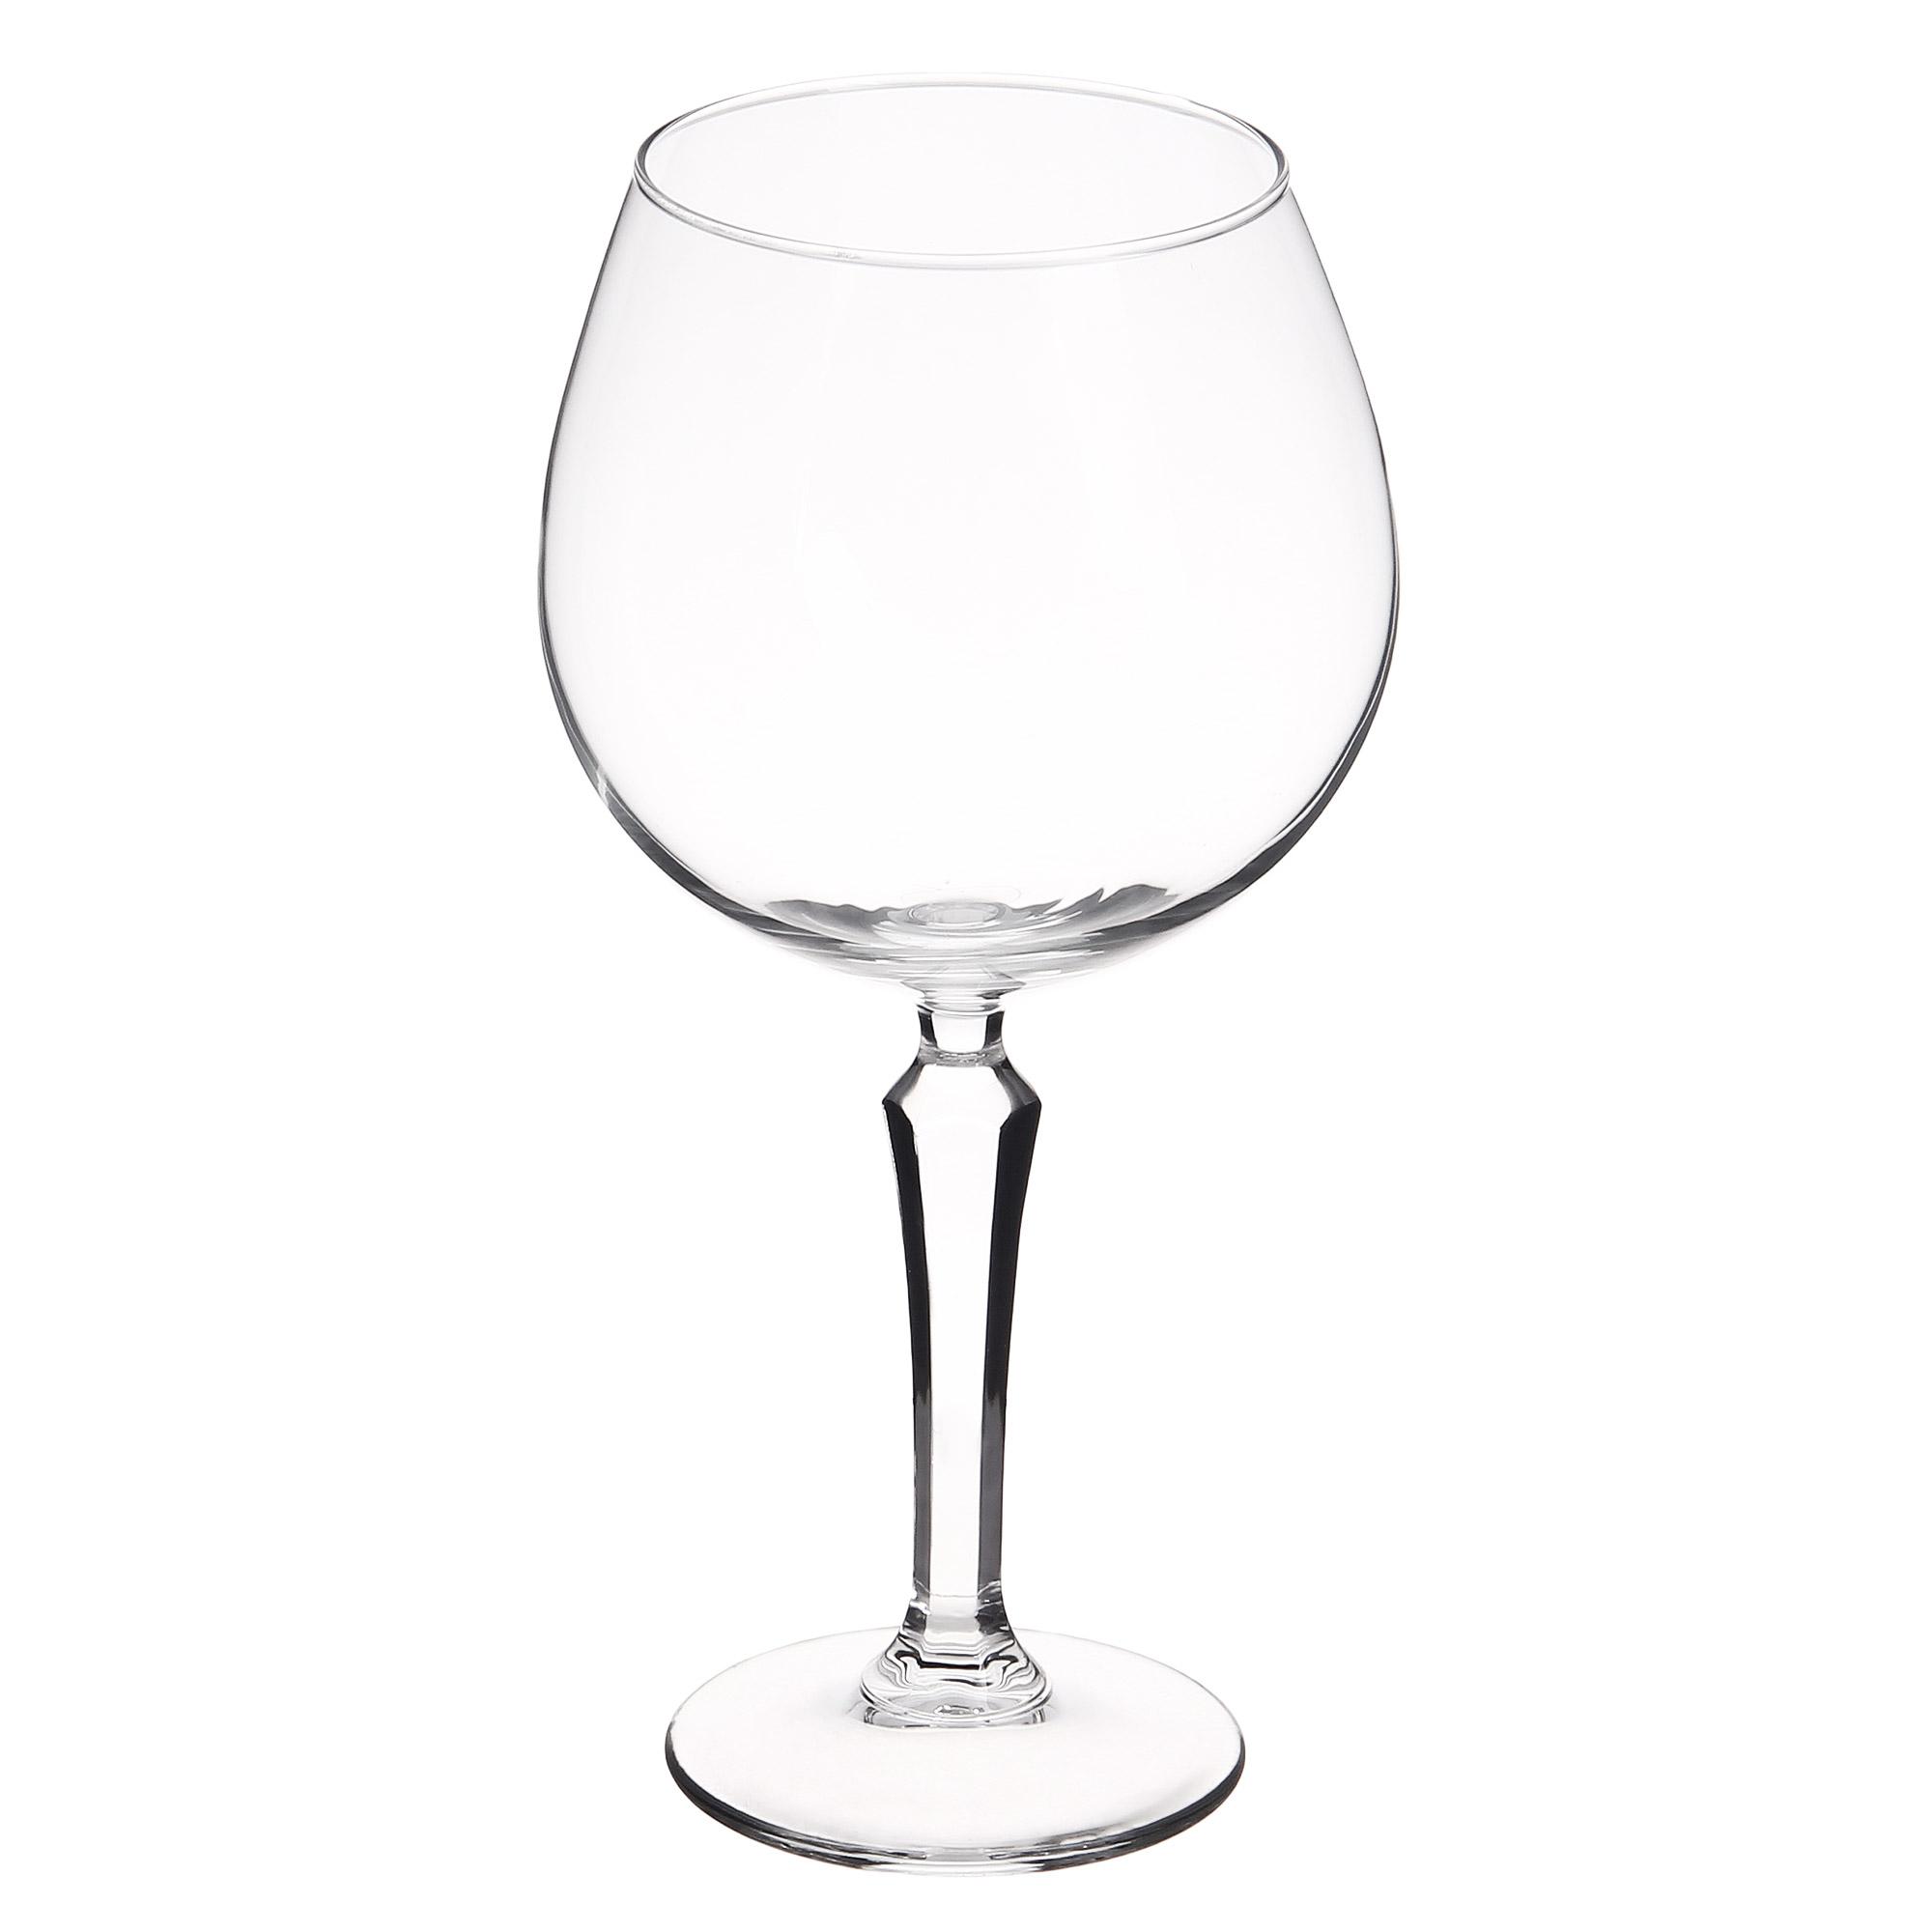 Набор бокалов Royal leerdam spksy gin&tonic 12шт 580мл фото